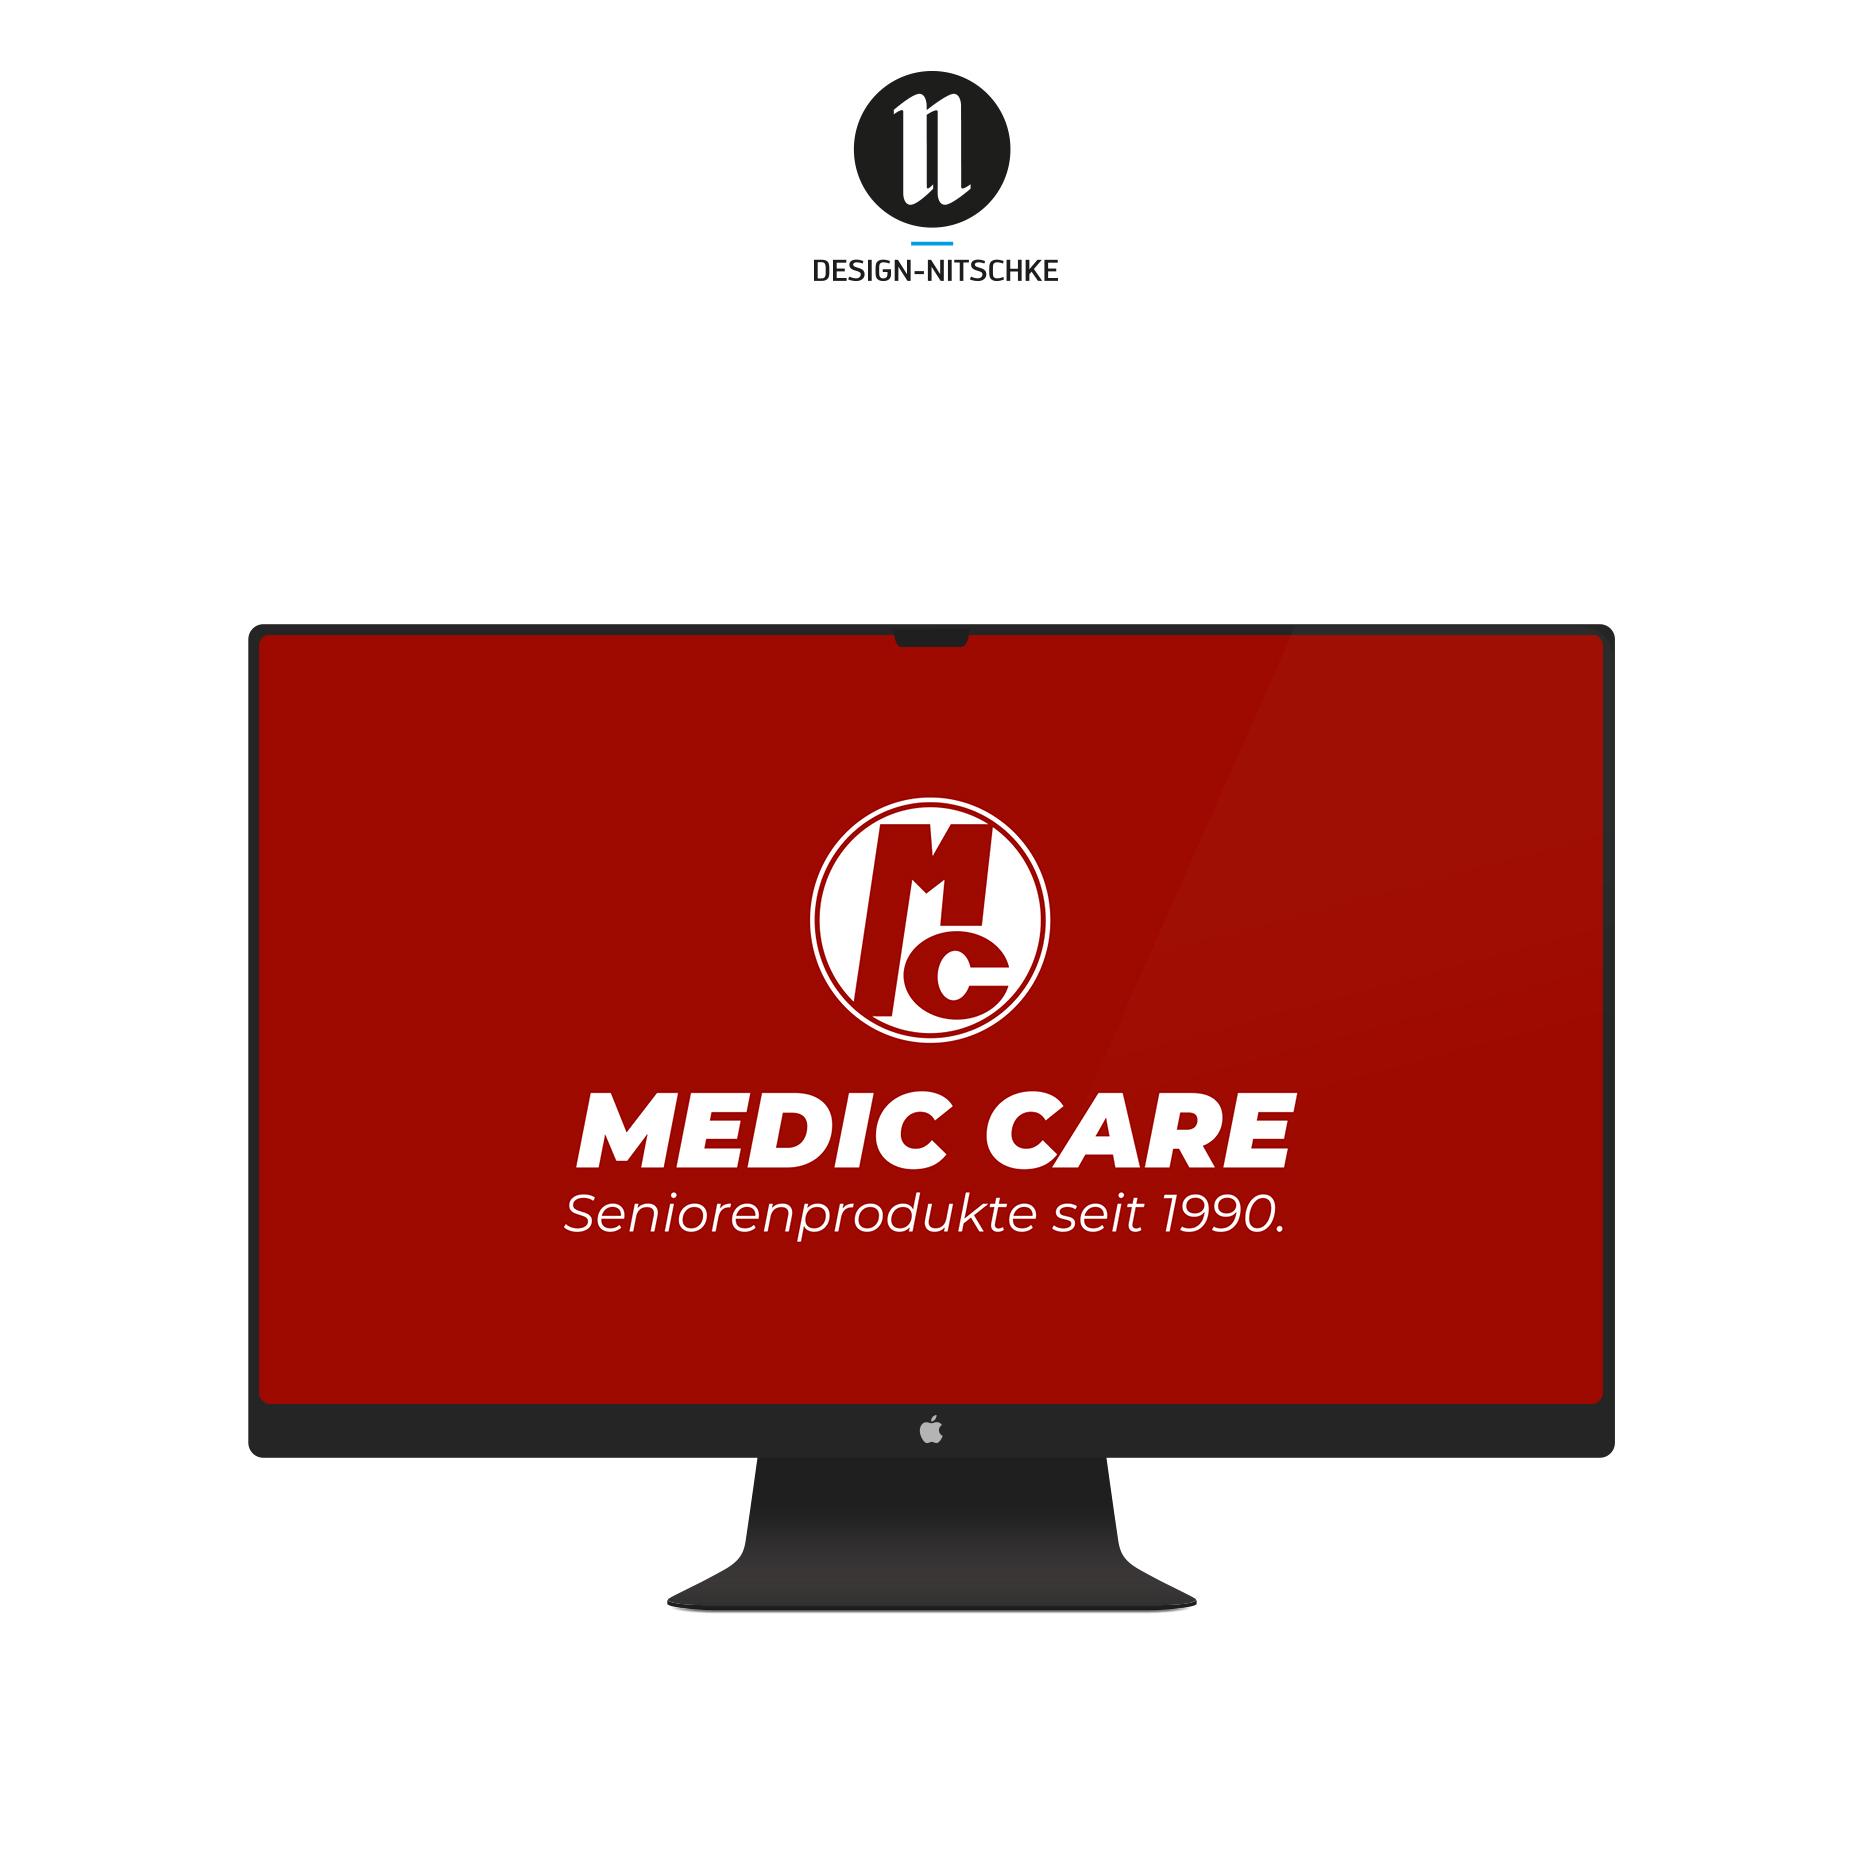 werbeagentur_oranienburg_nitschke_medic_care_seniorenprodukte_ci_logo_redesign.jpg